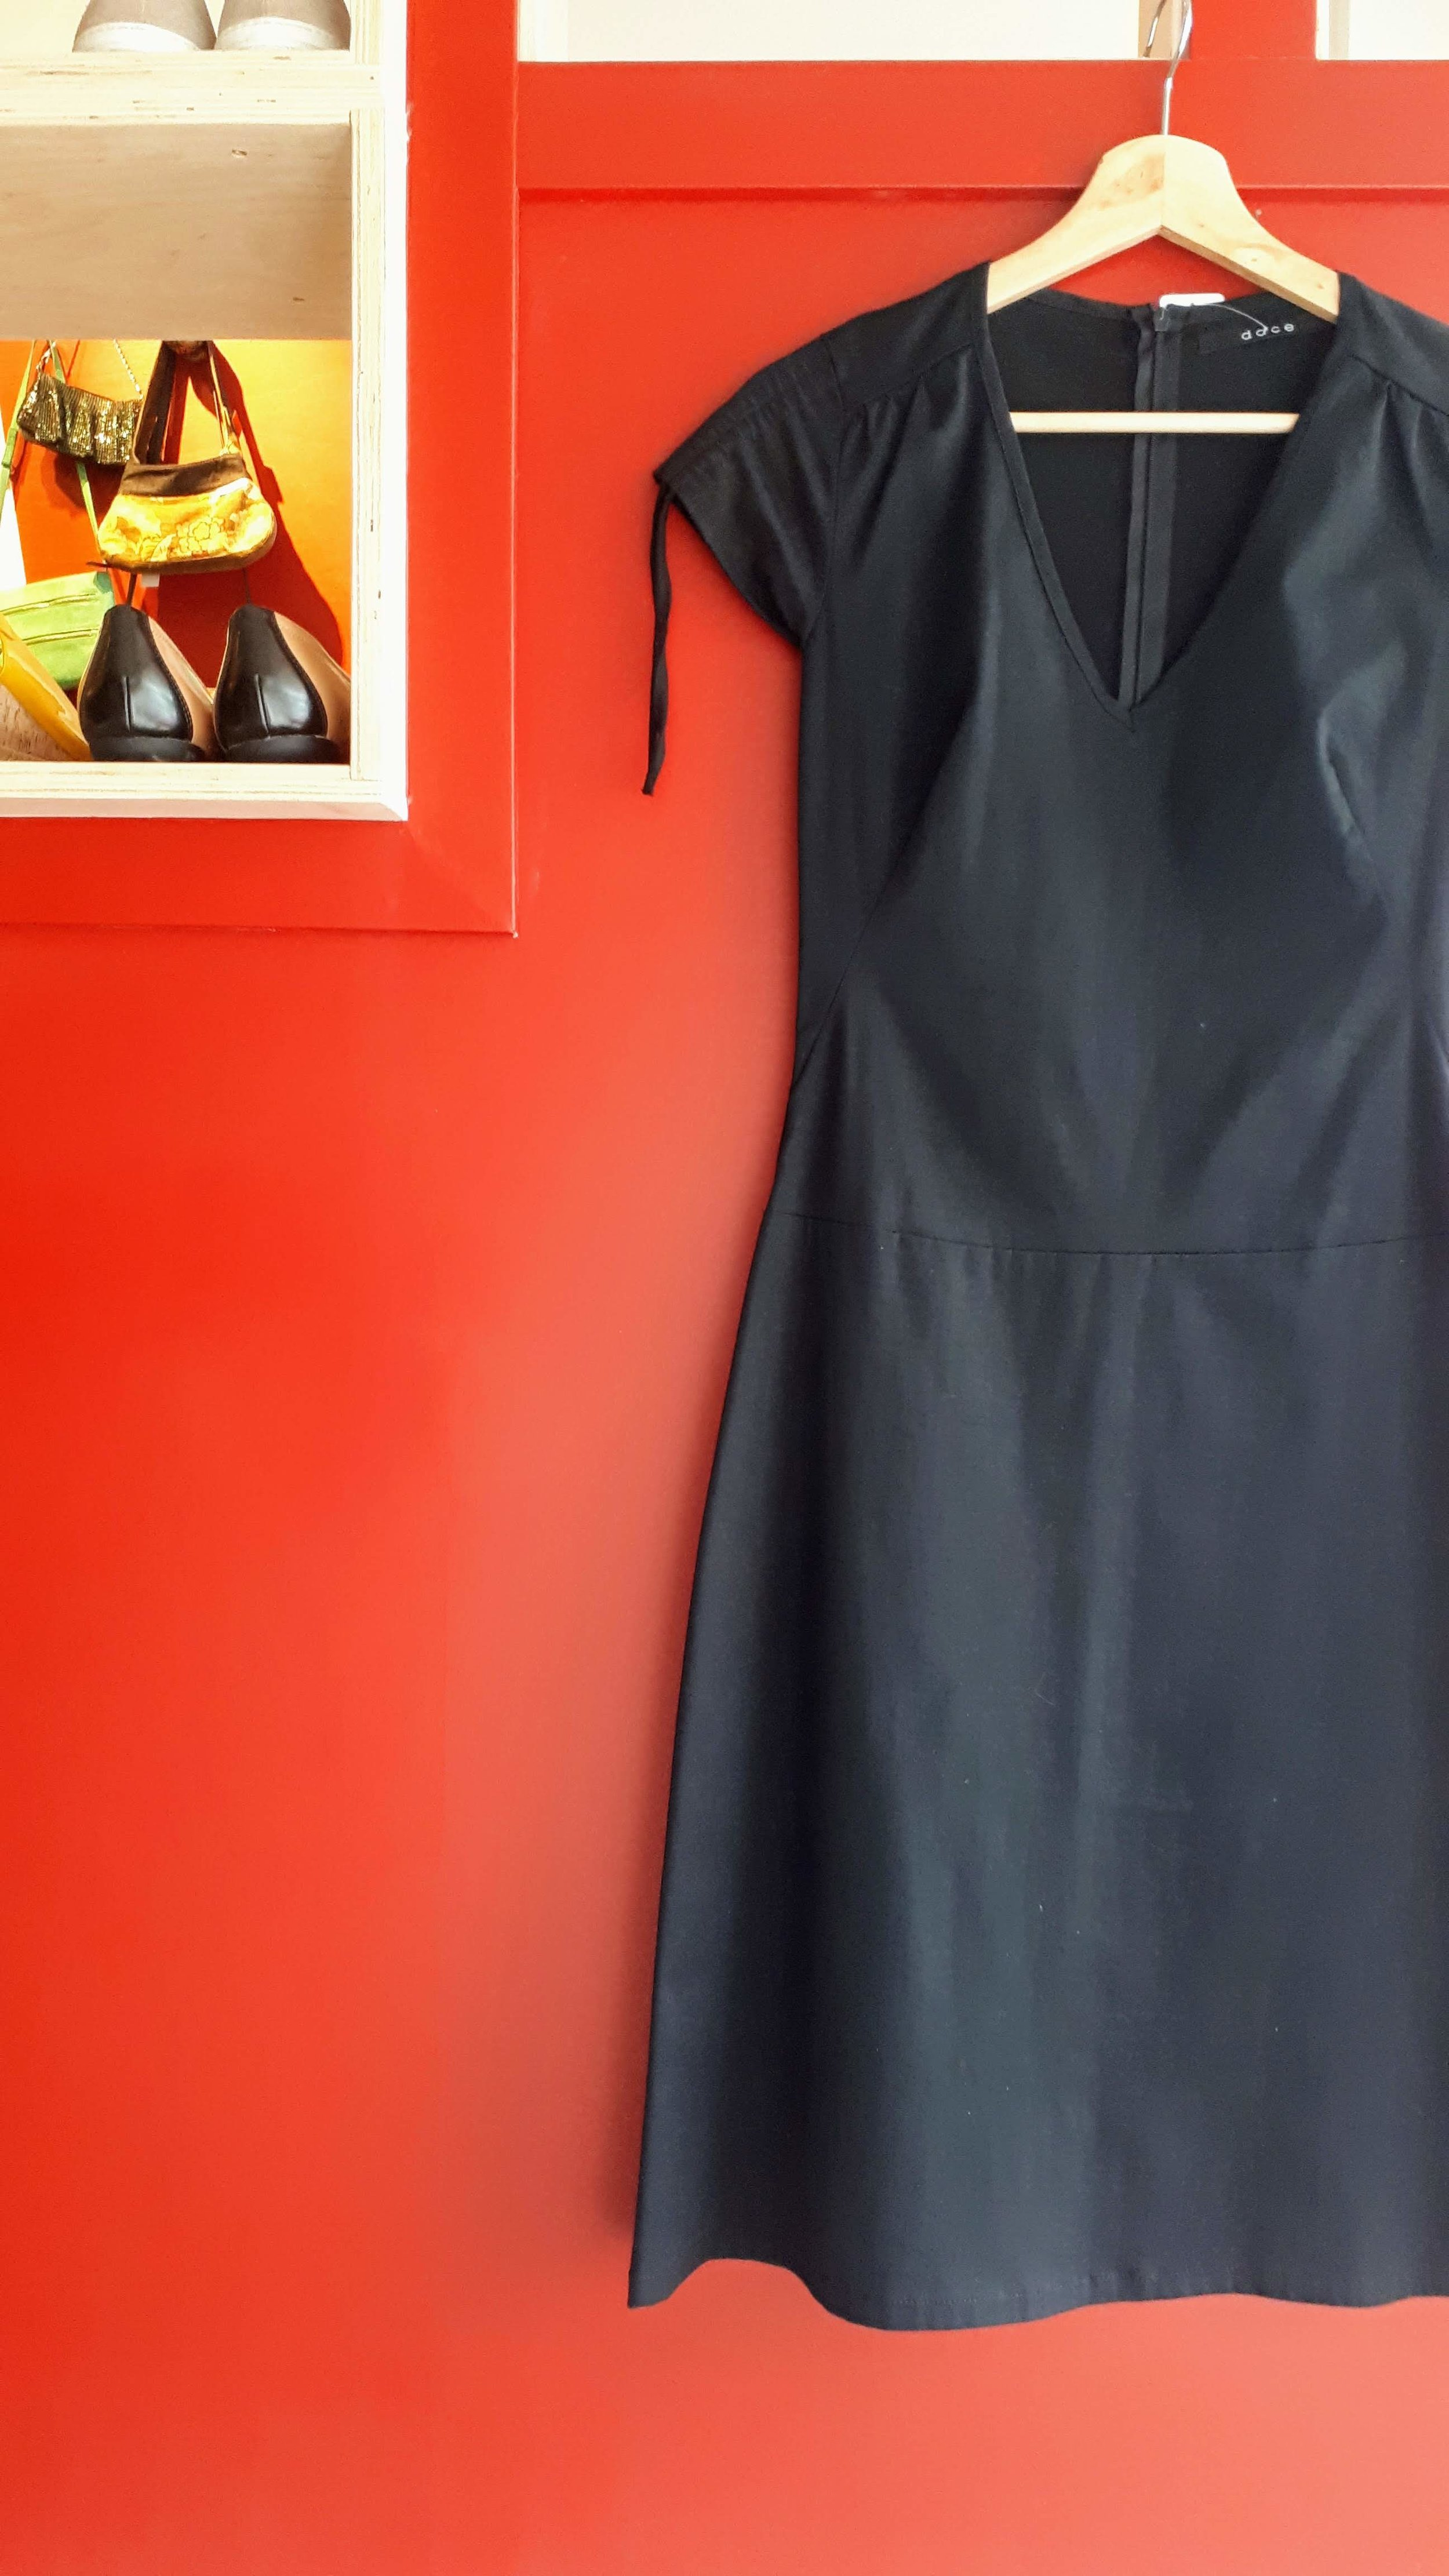 Dace dress; Size S, $36